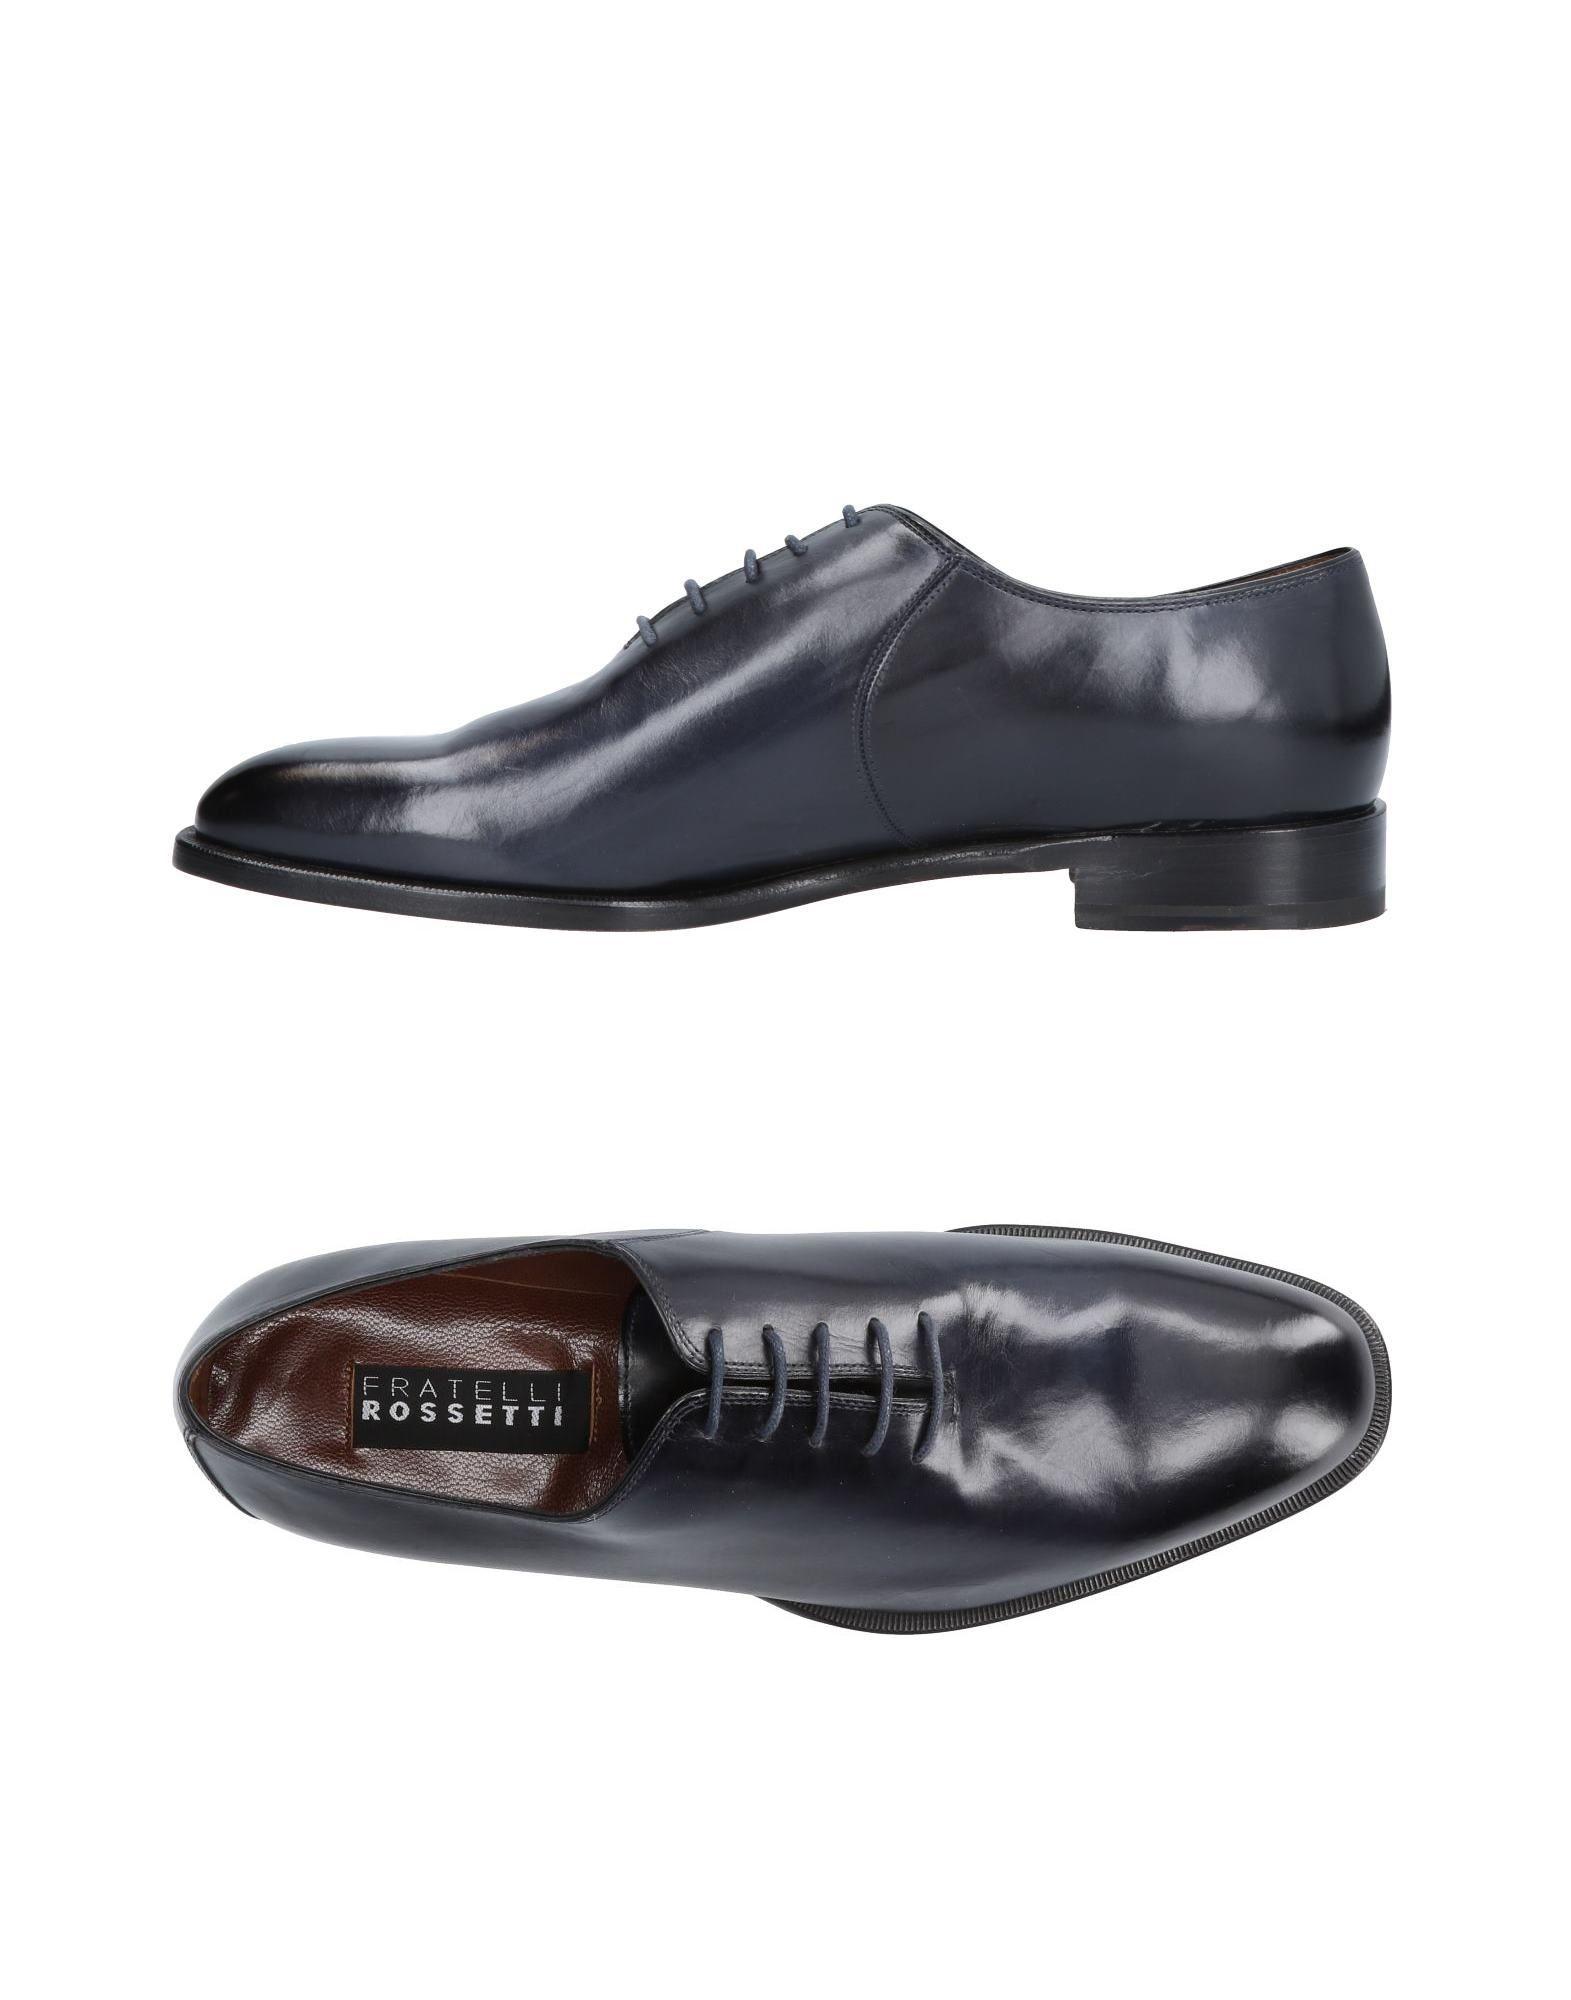 Fratelli Rossetti Schnürschuhe Herren  11440924OG Gute Qualität beliebte Schuhe